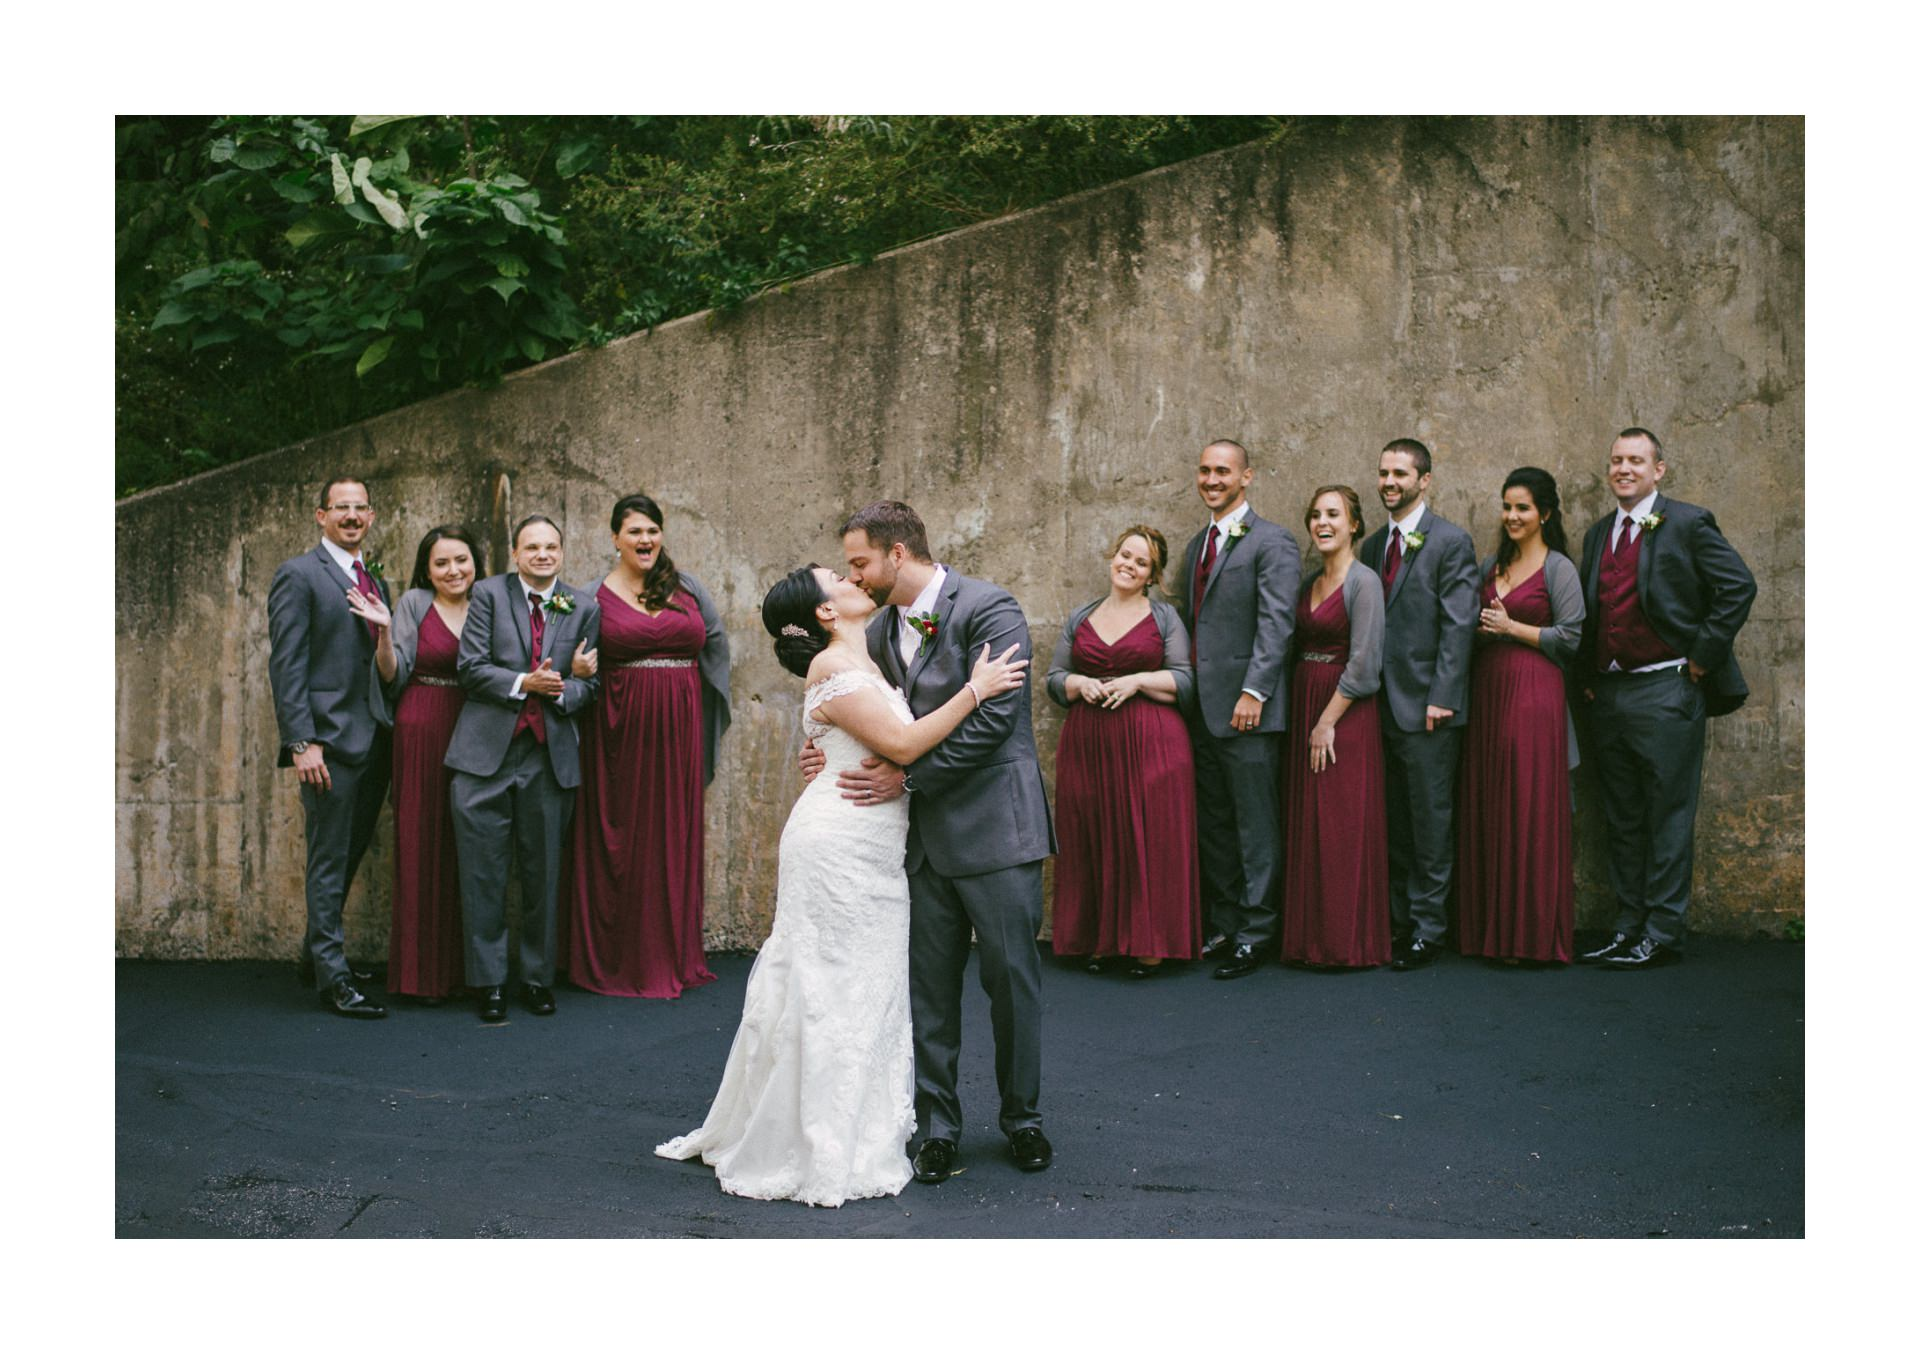 Patterson Fruit Farm Wedding Photographer in Cleveland 1 39.jpg